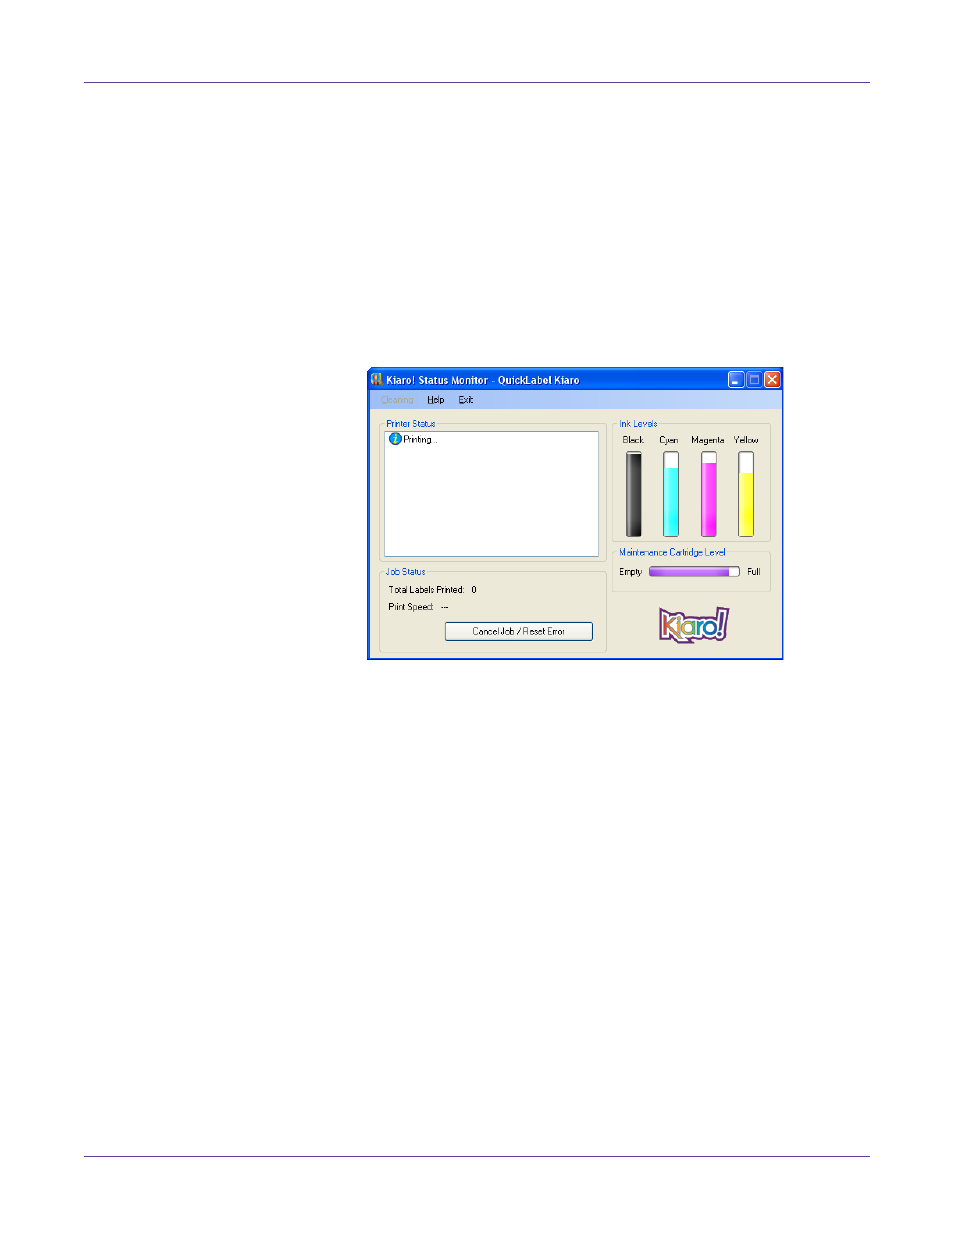 Using the status monitor, Viewing the printer status